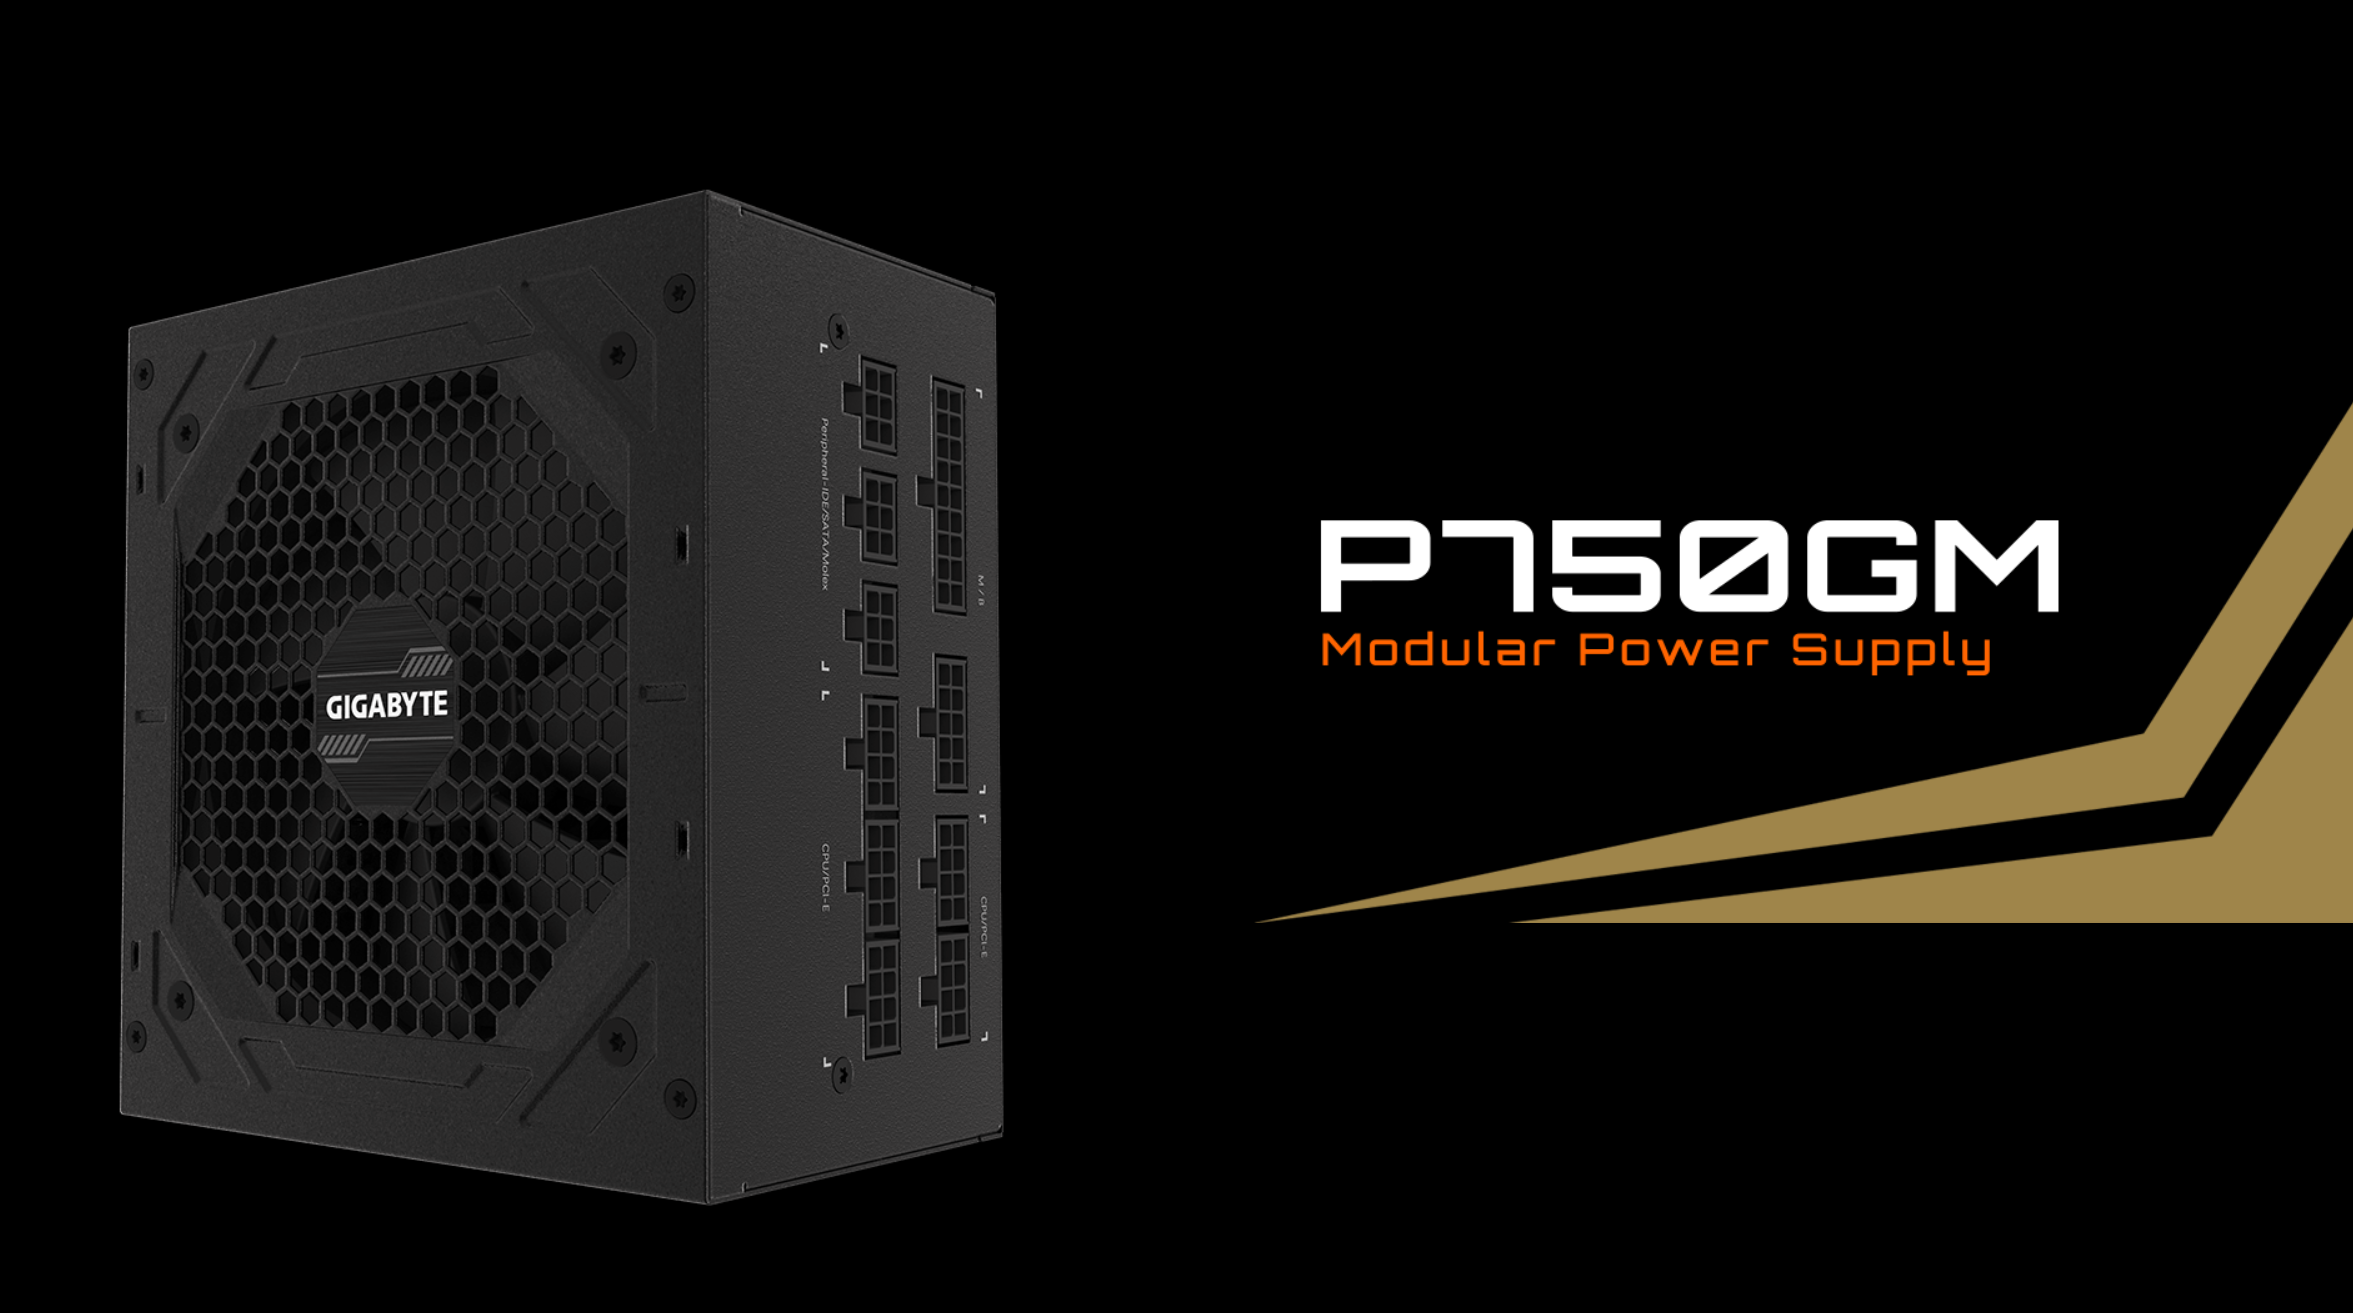 Gigabyte-Exploding-PSU-GP-850GM-GP-750GM-Series-_1.png